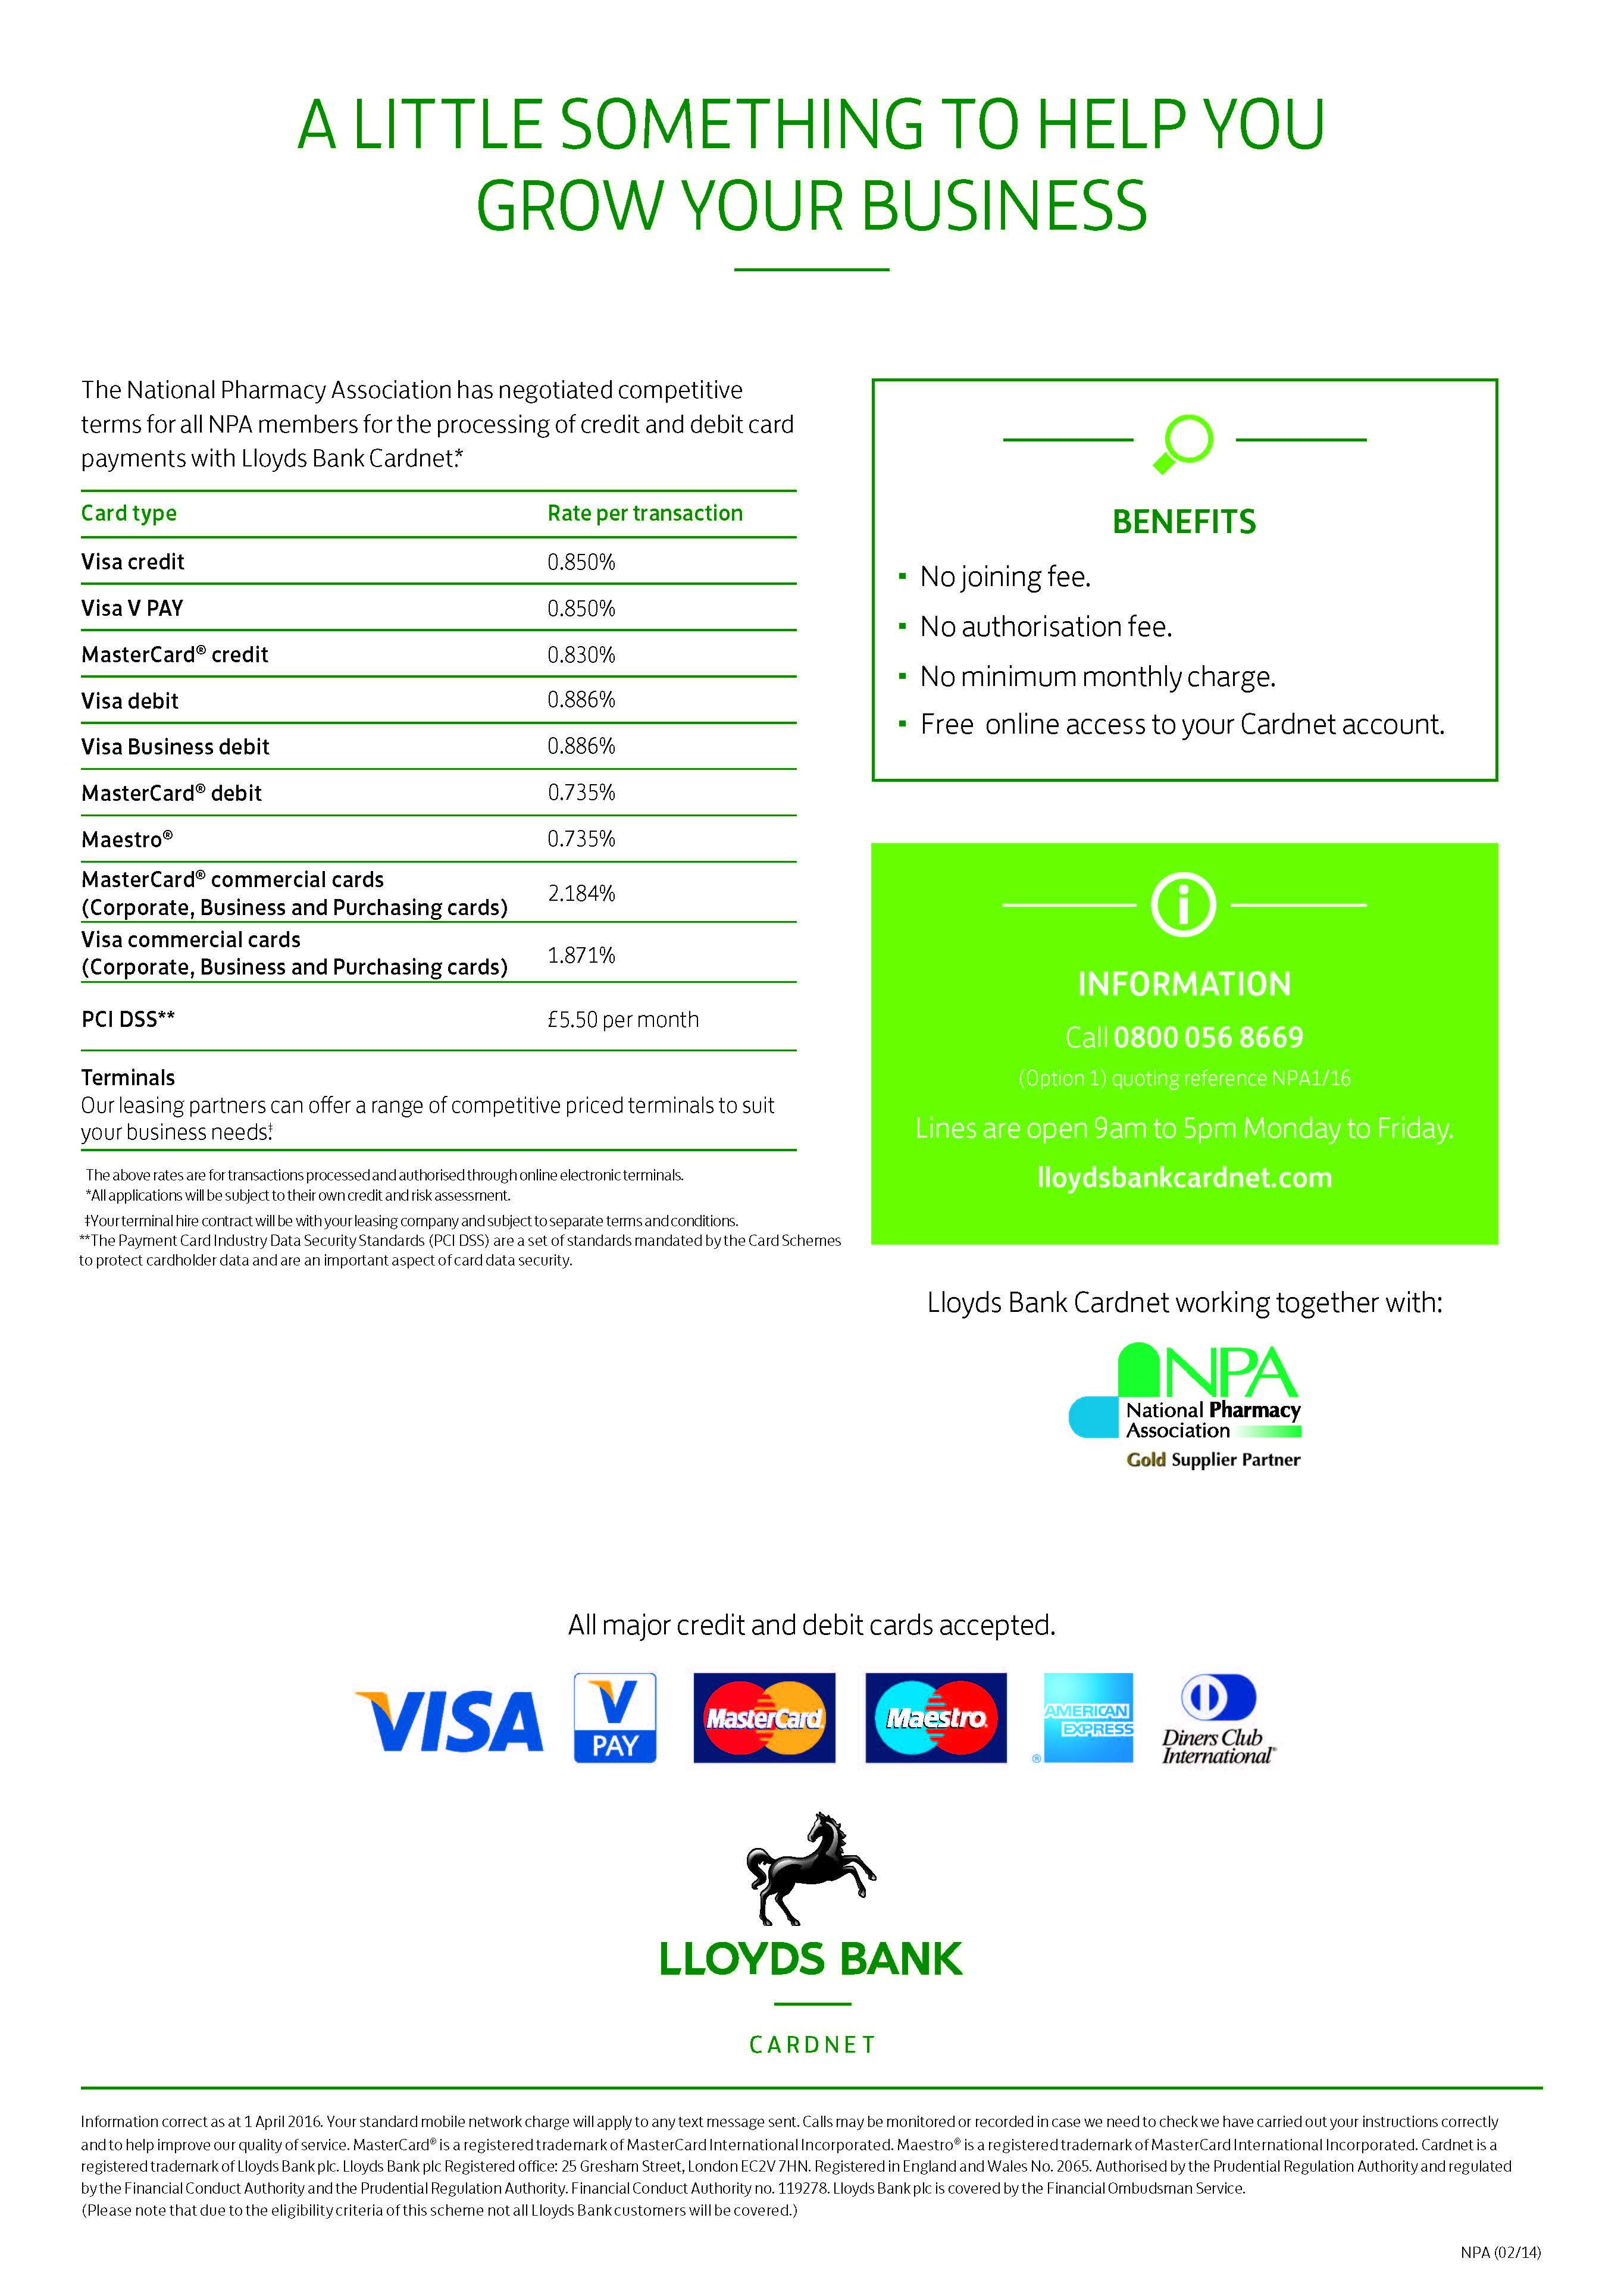 Lloyds bank cardnet offer npa npa lloyds bank cardnet offer reheart Gallery